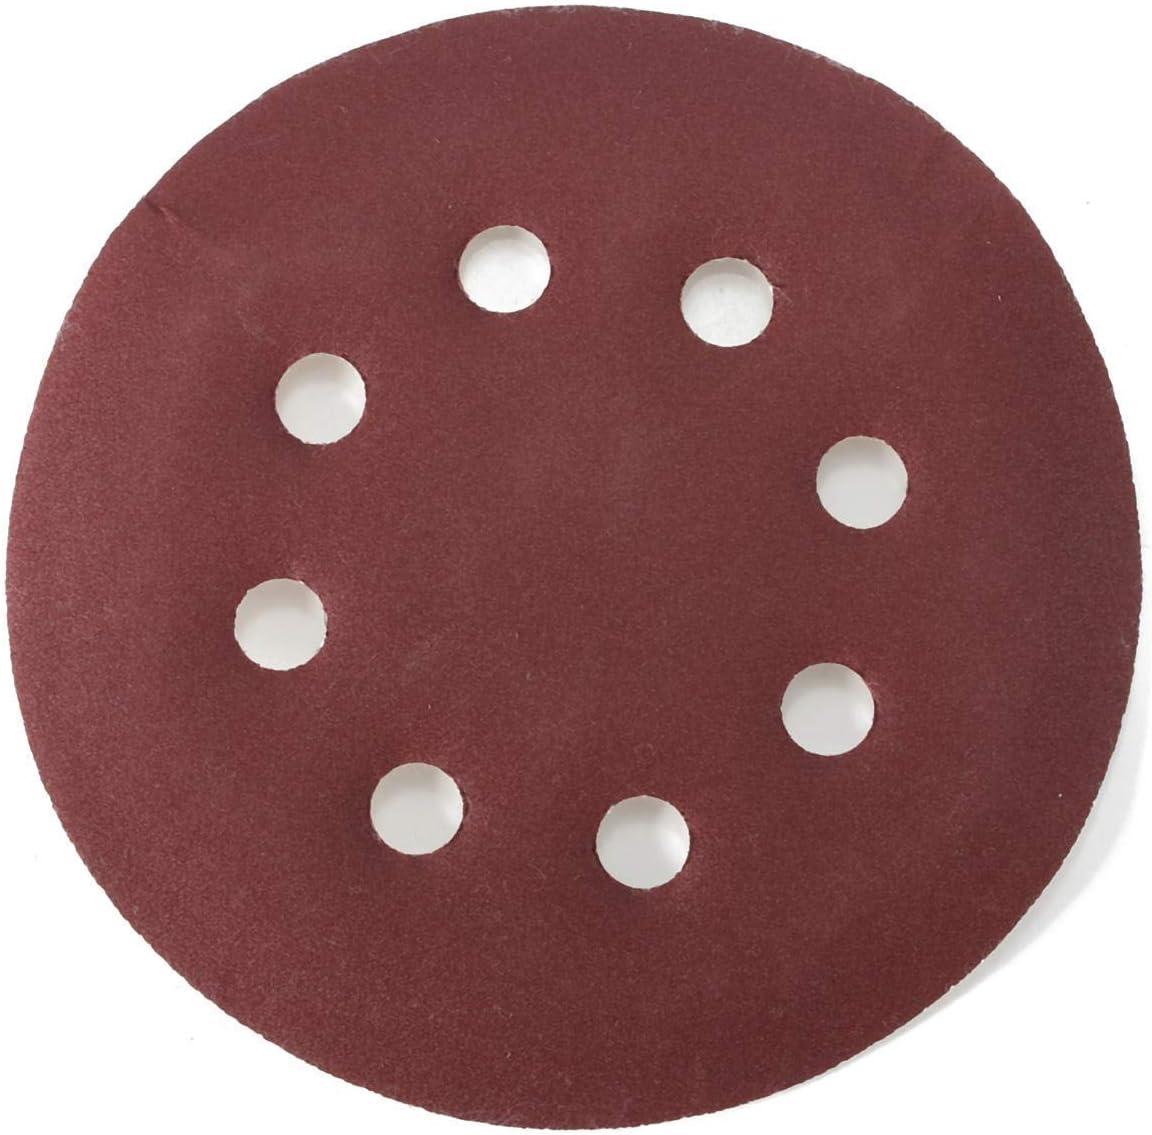 ZXY-NAN 8 Holes Abrasive Polishing Sandpaper Sand Sheets 25pcs 400 Grit 5 Incch Sanding Disc Set Grinding and Polishing